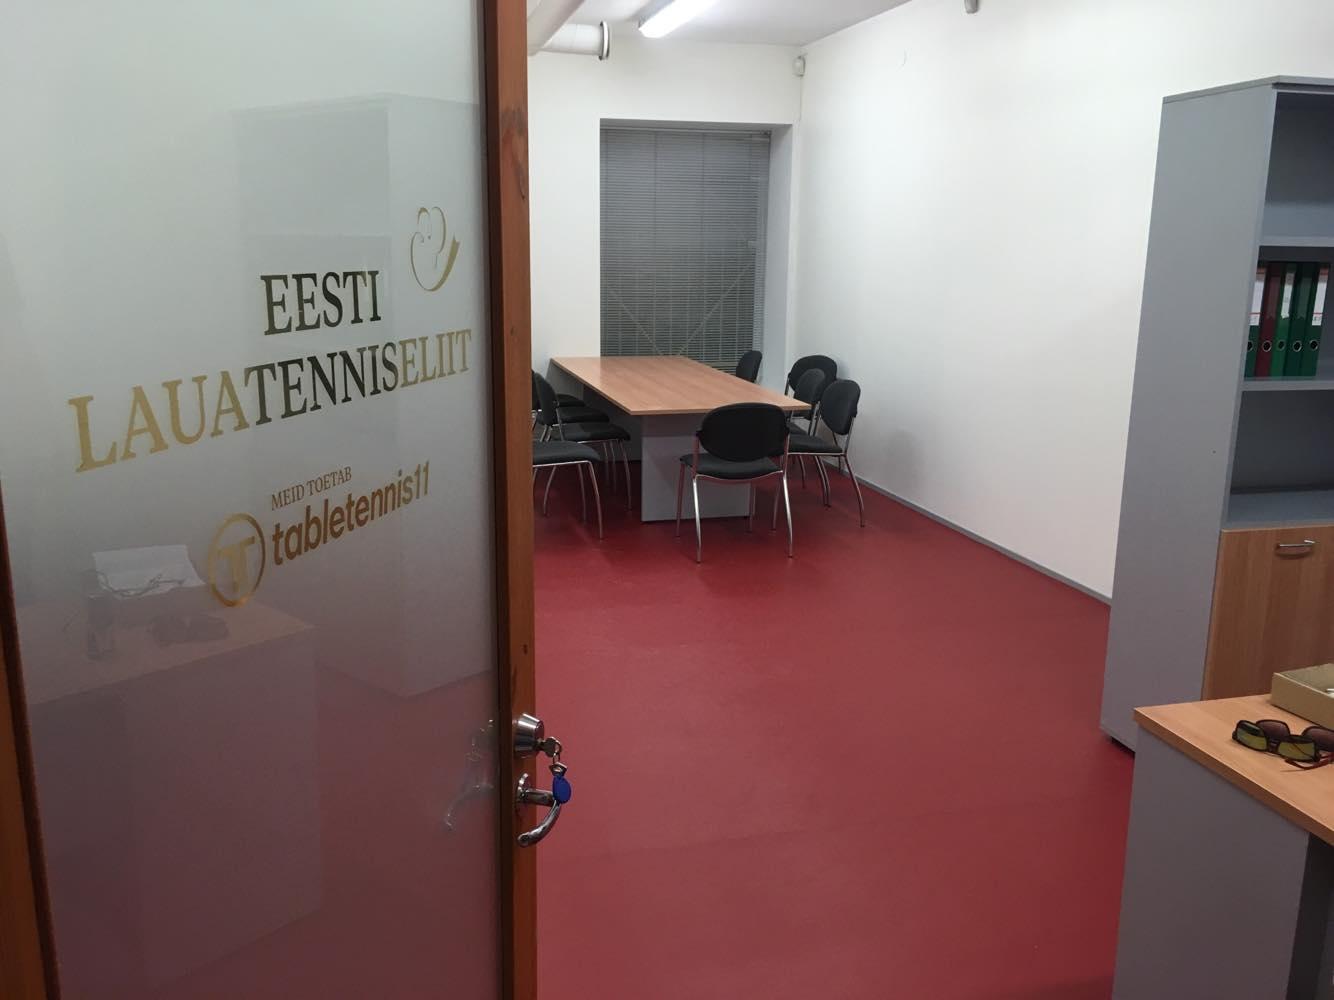 Eesti Lauatenniseliit avas kontori